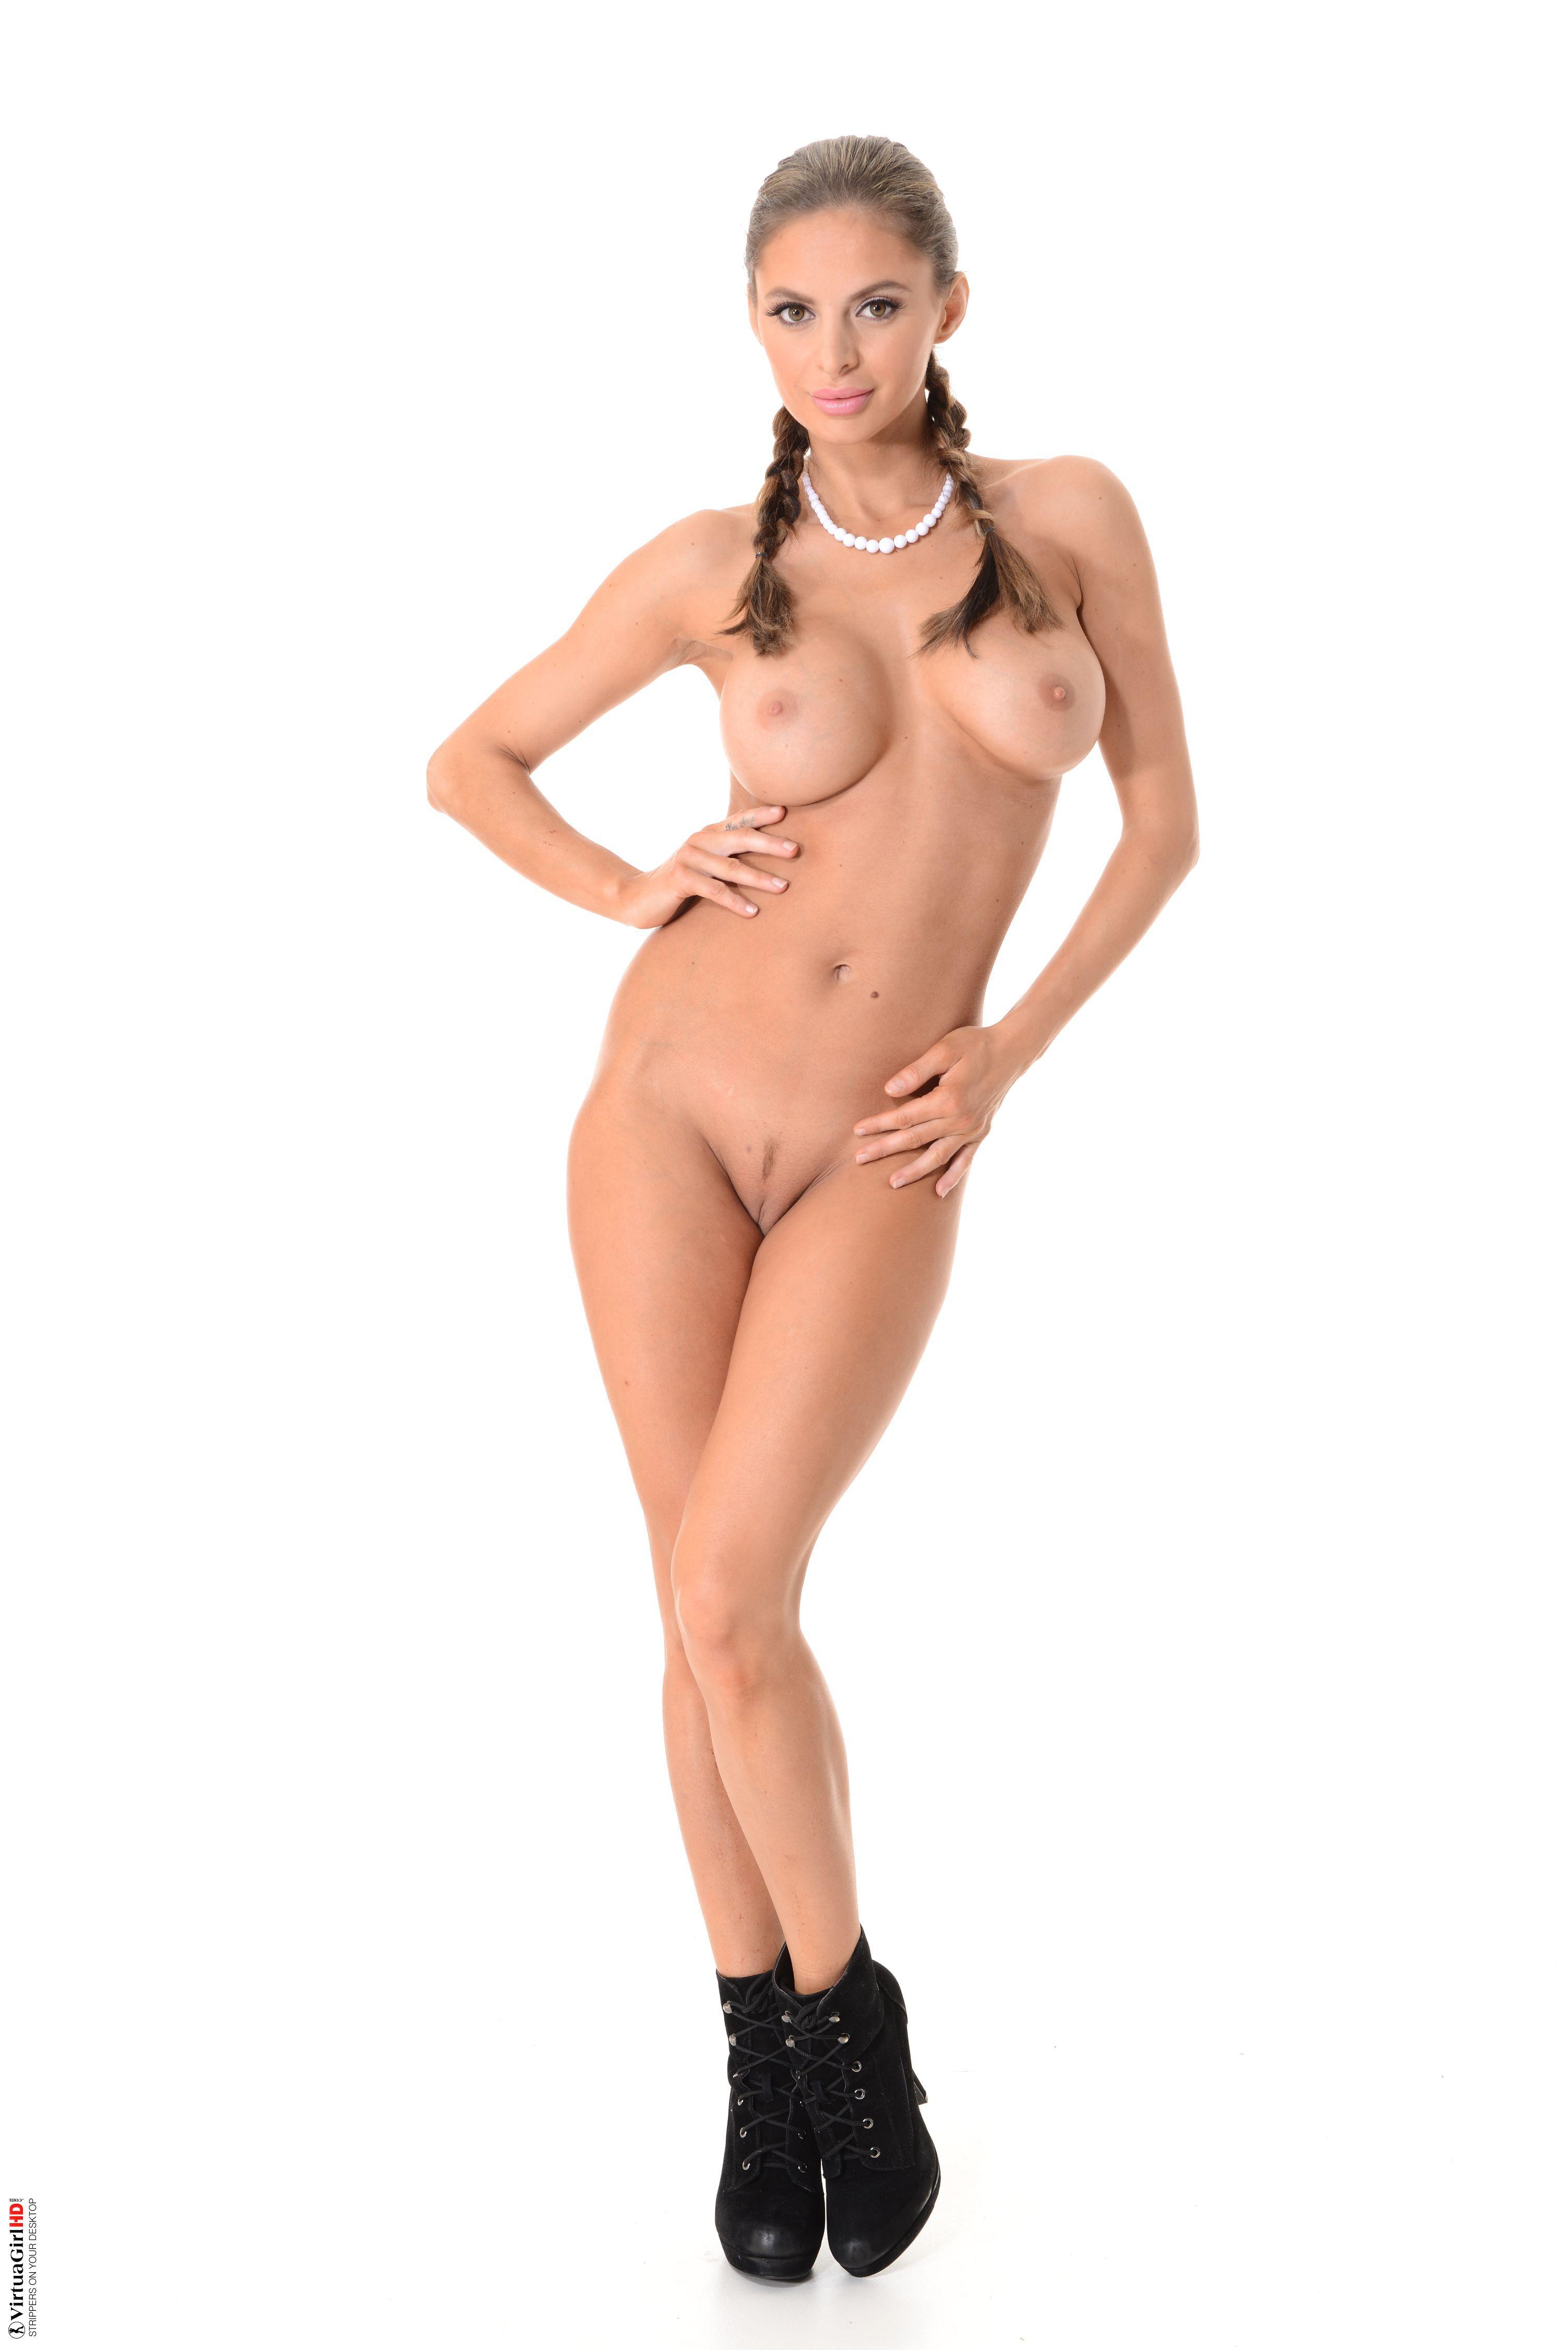 hot nude girl hd wallpaper